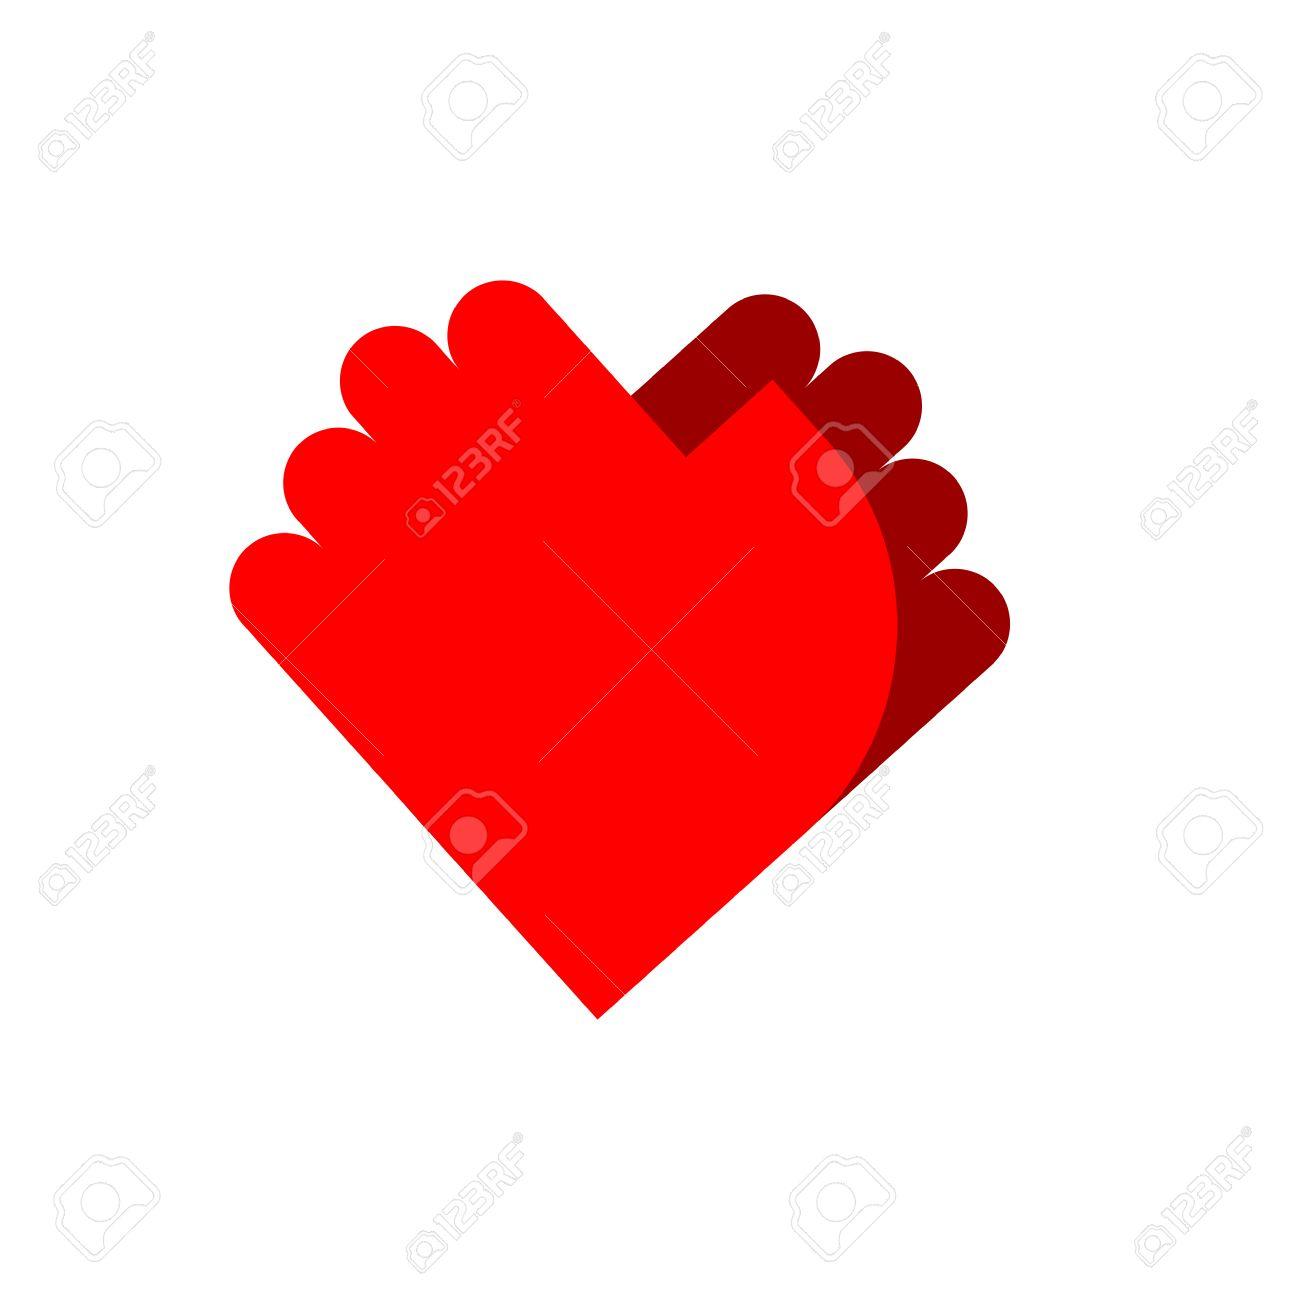 Friendship Palm Emblem Two Hands Symbol Love Royalty Free